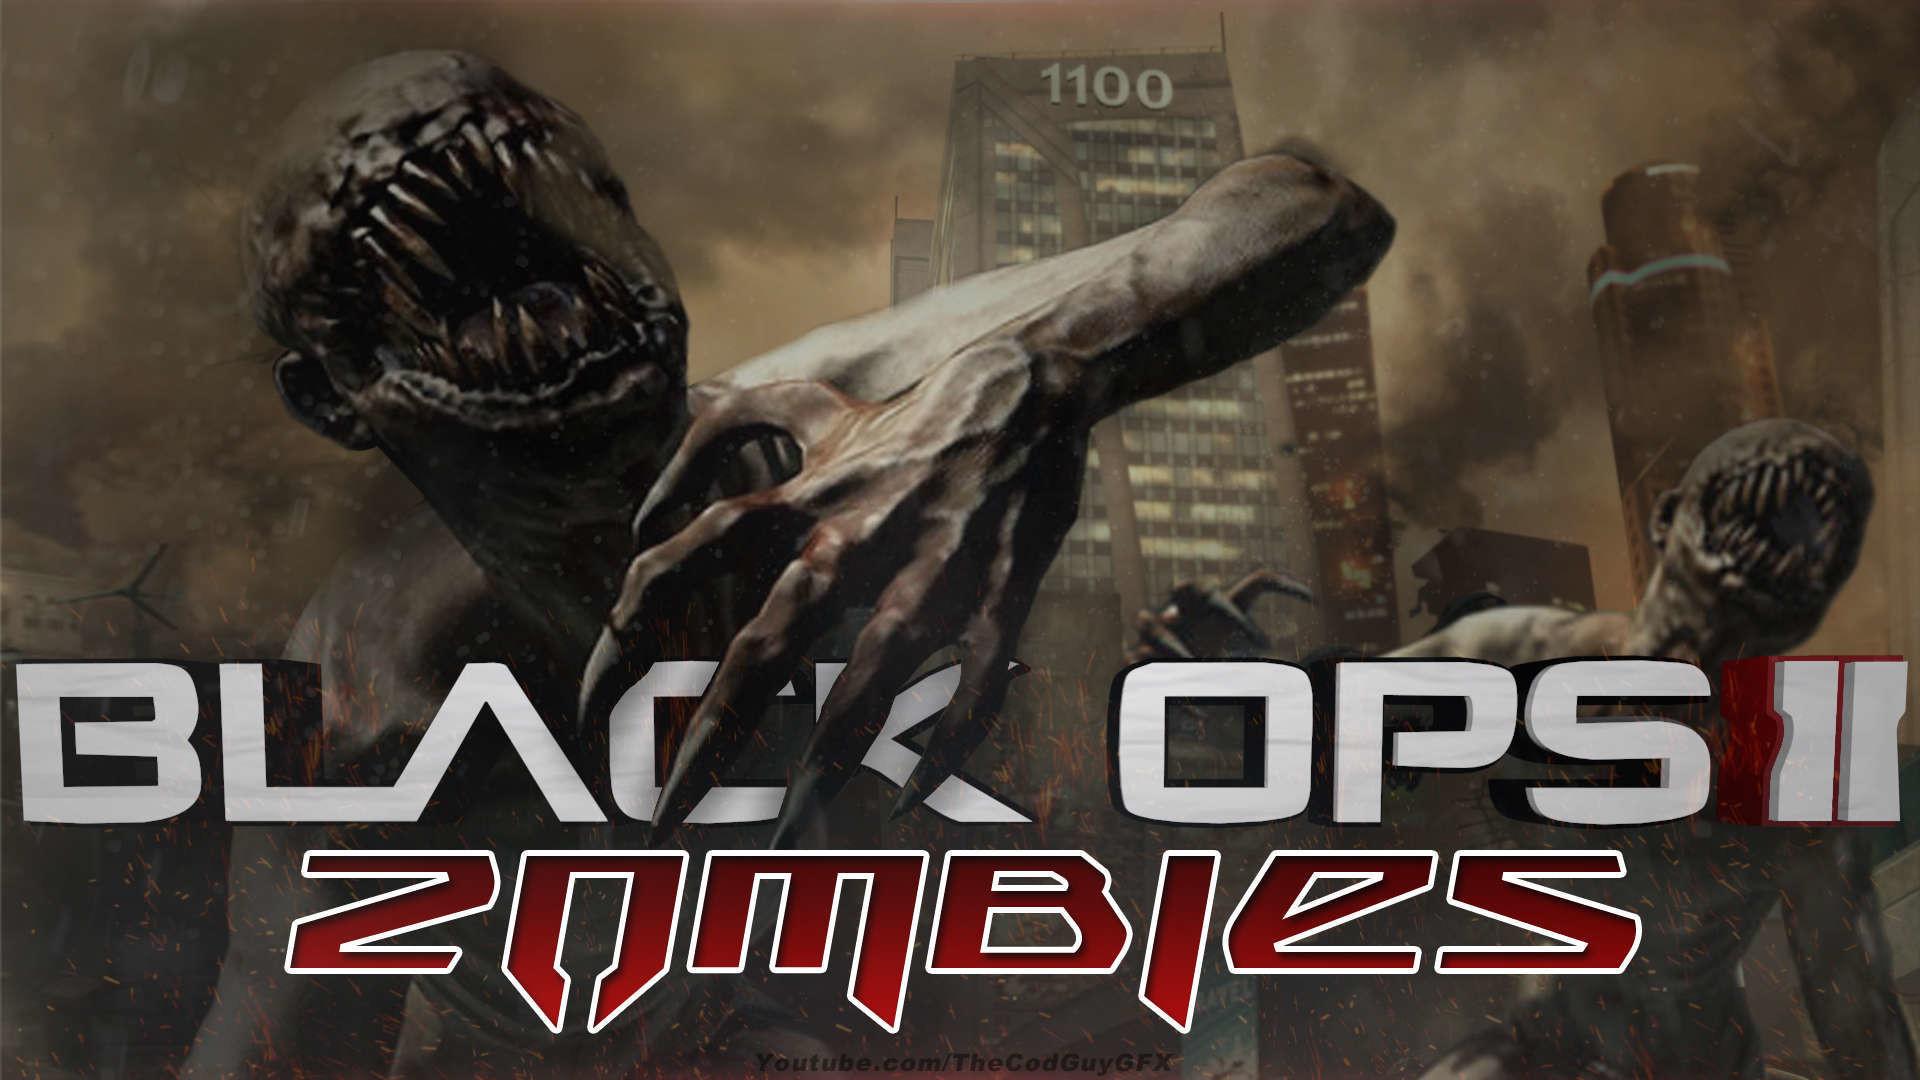 Wallpaper: Black Ops 3 Hd Wallpaper 1080p. Upload at April 27, 2015 by